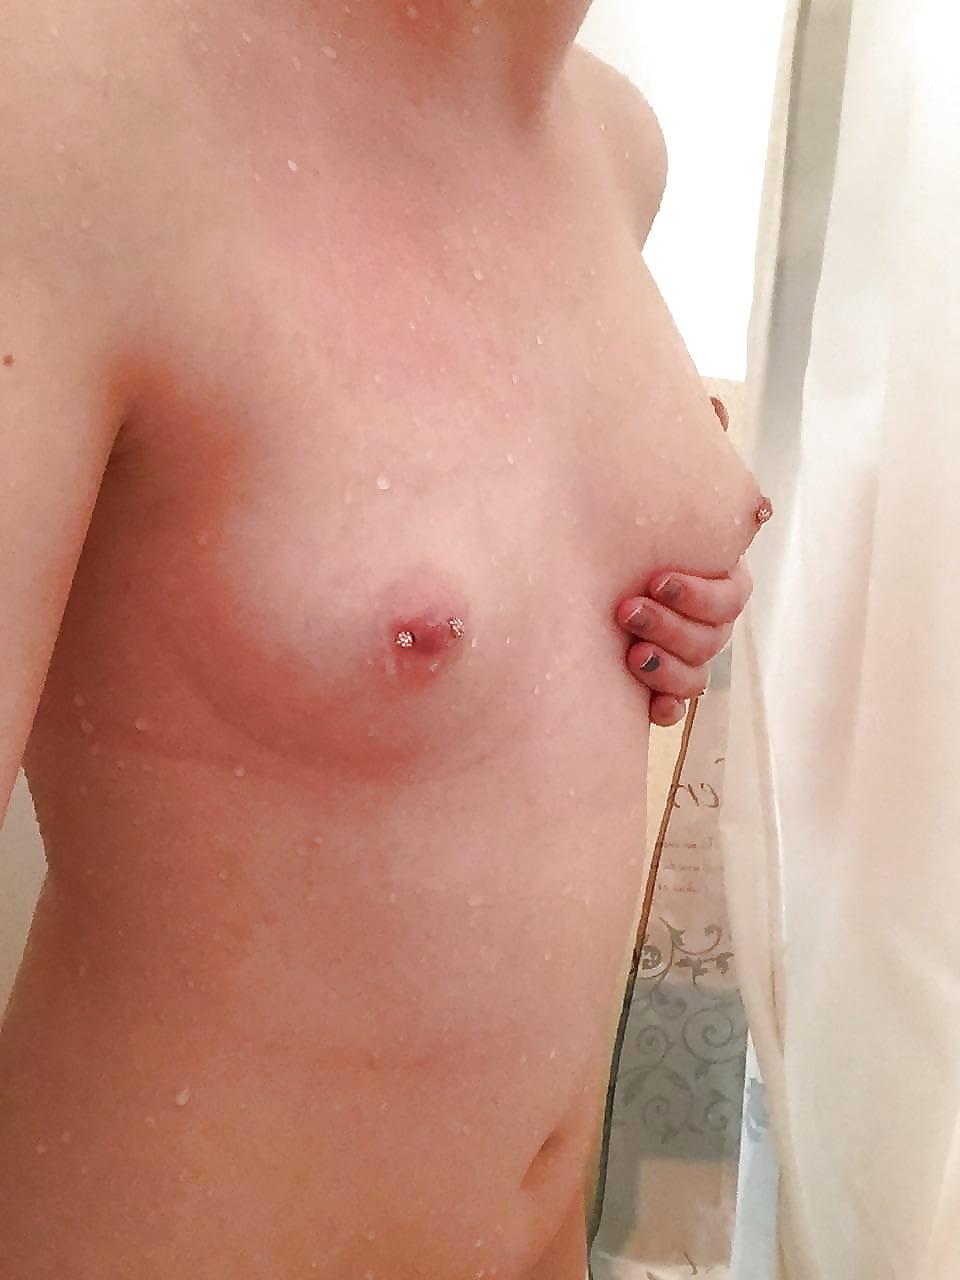 Big tit sissy